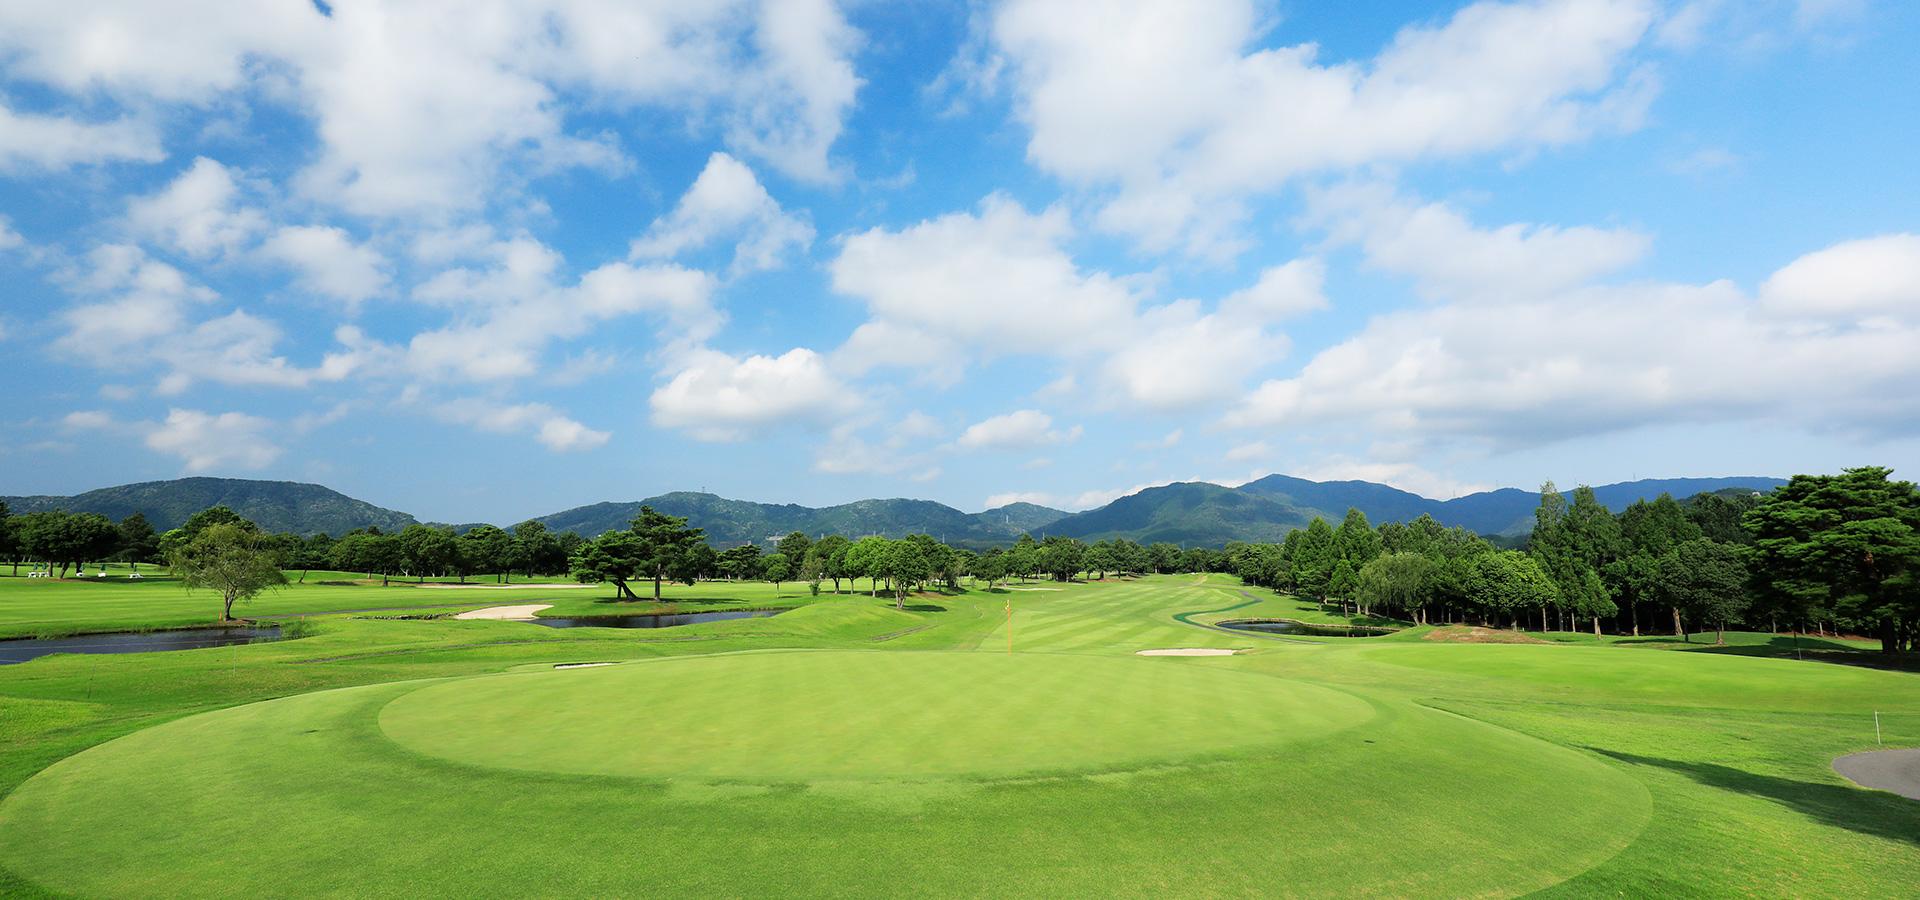 Seta Golf Course (54 holes)